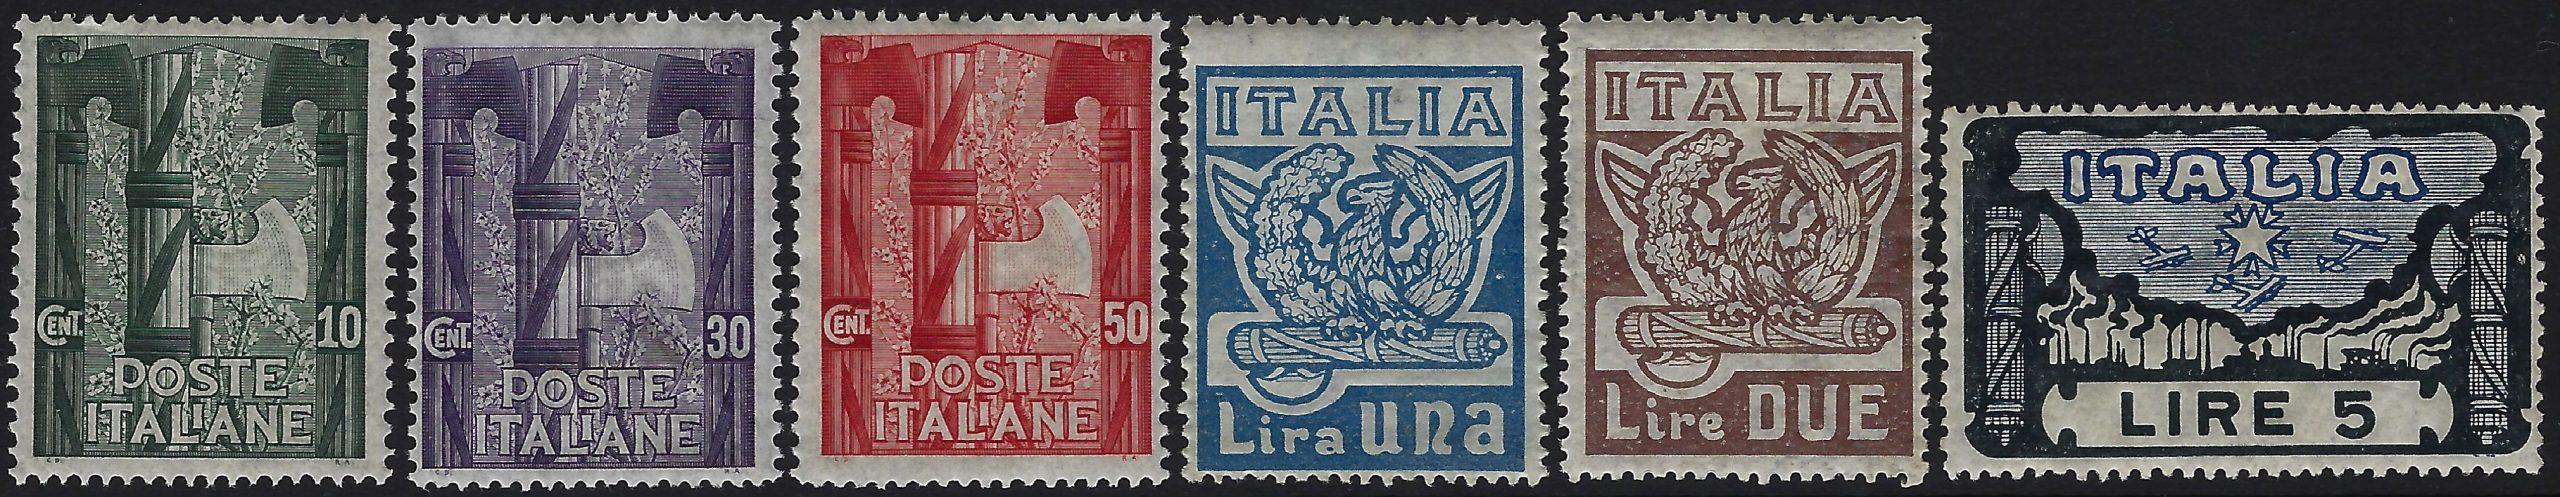 1923 Marcia su Roma MNH